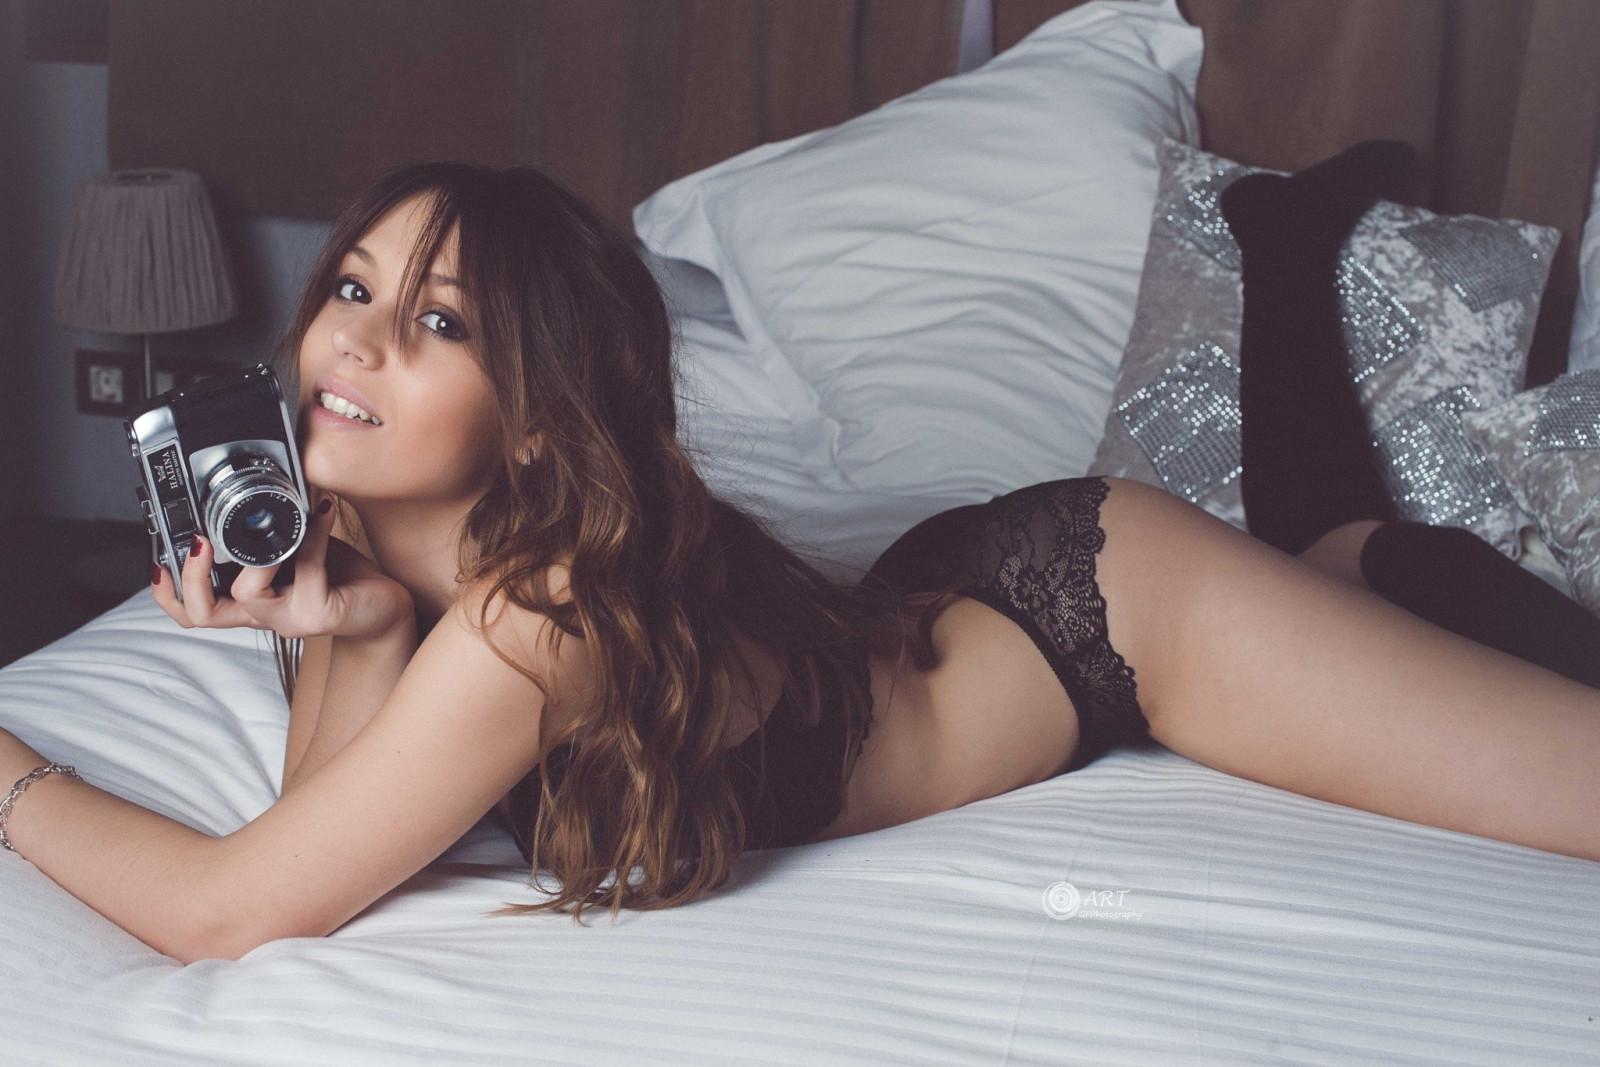 Wallpaper : women, model, long hair, brunette, ass, in bed